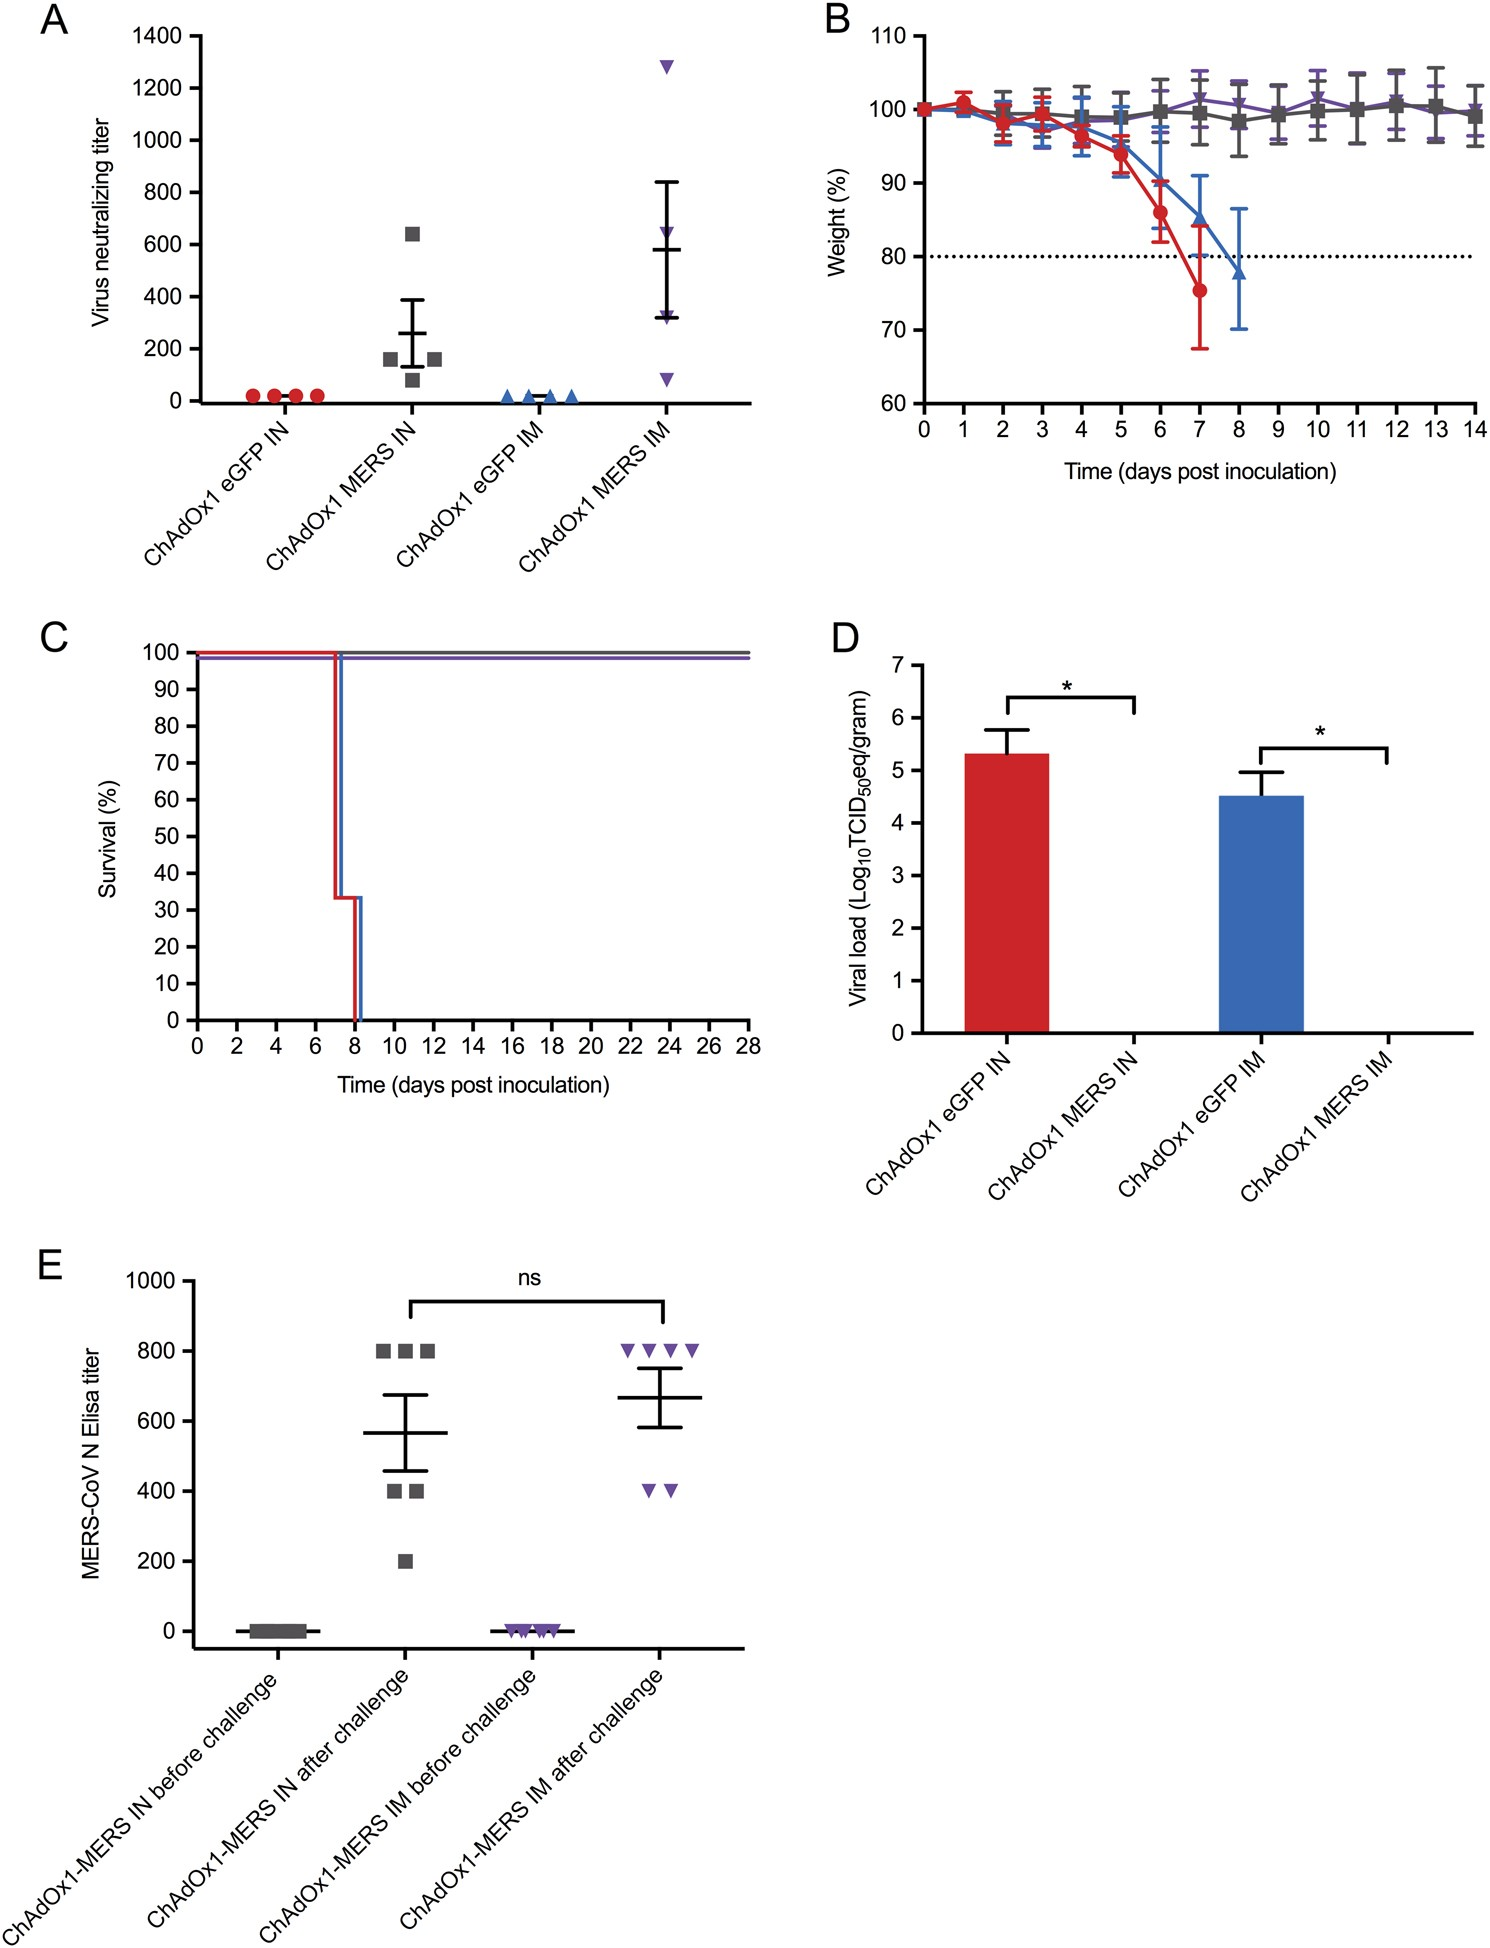 Protective efficacy of a novel simian adenovirus vaccine